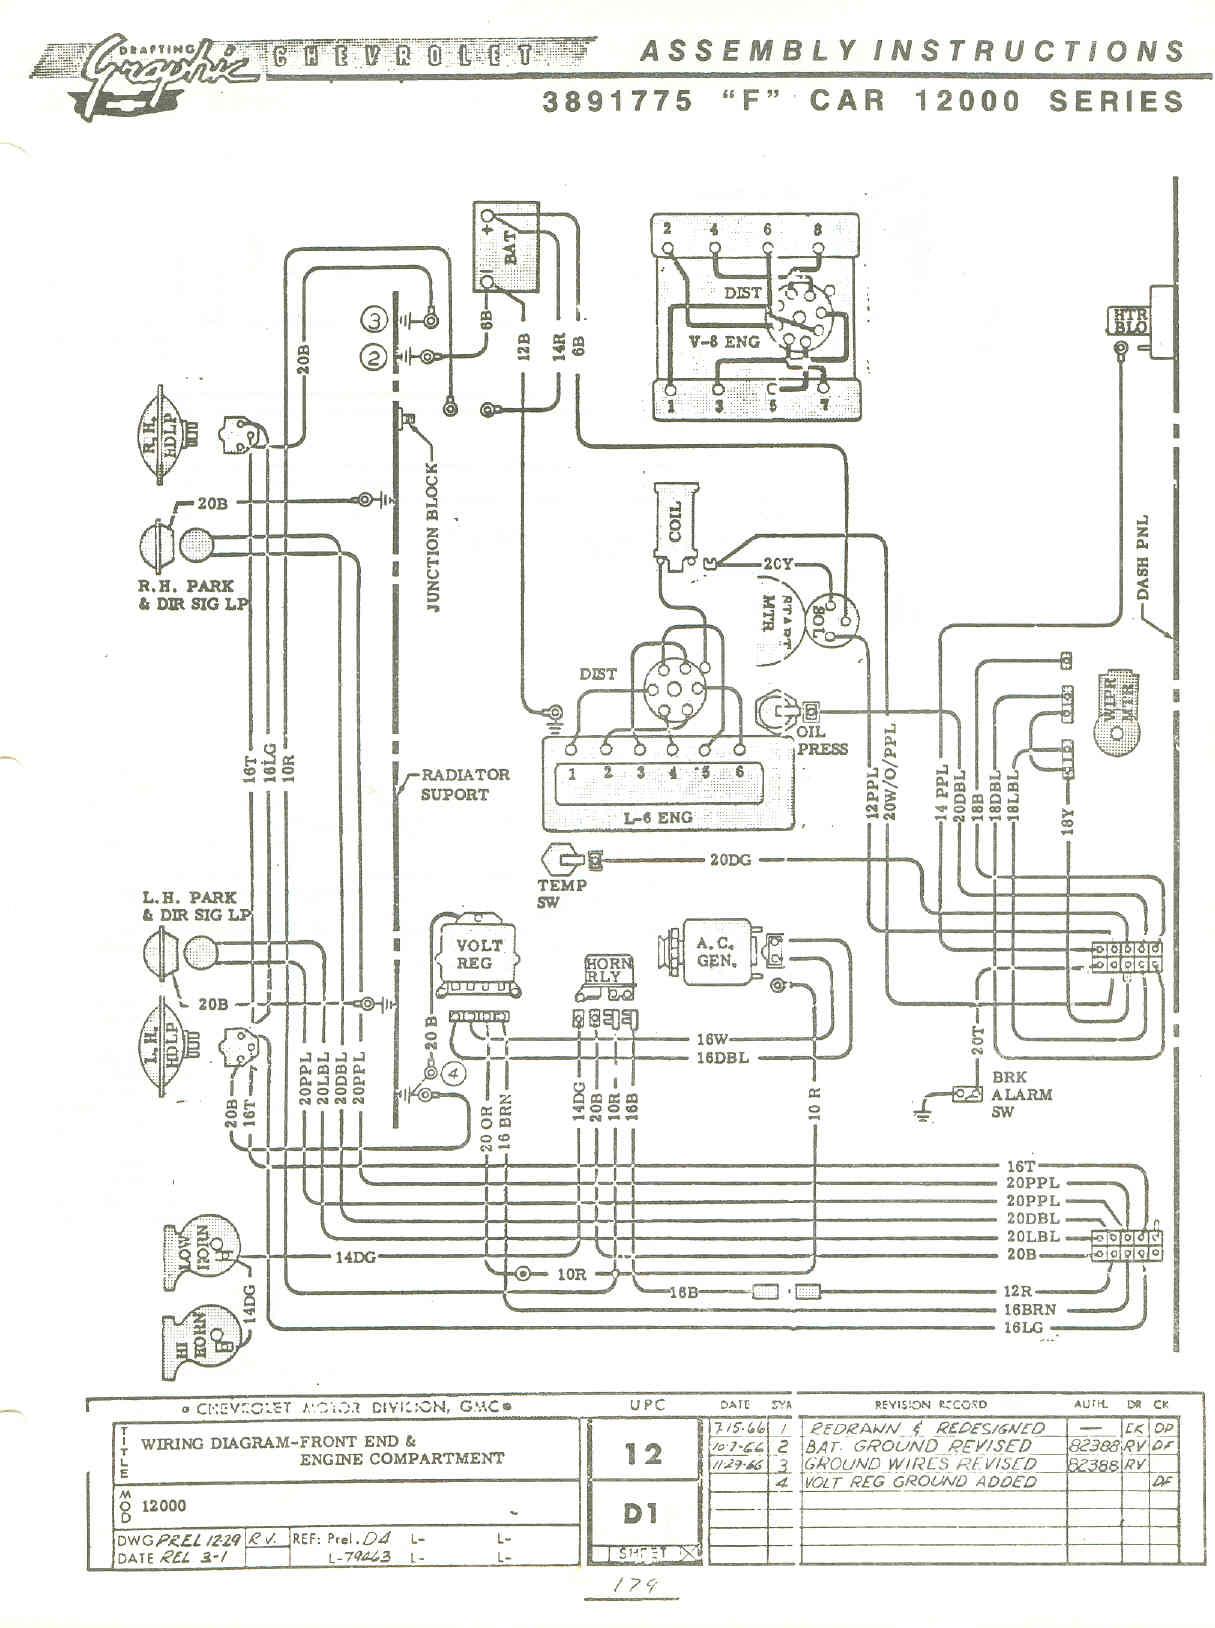 Headlight Switch Wiring Diagram Chevy Truck